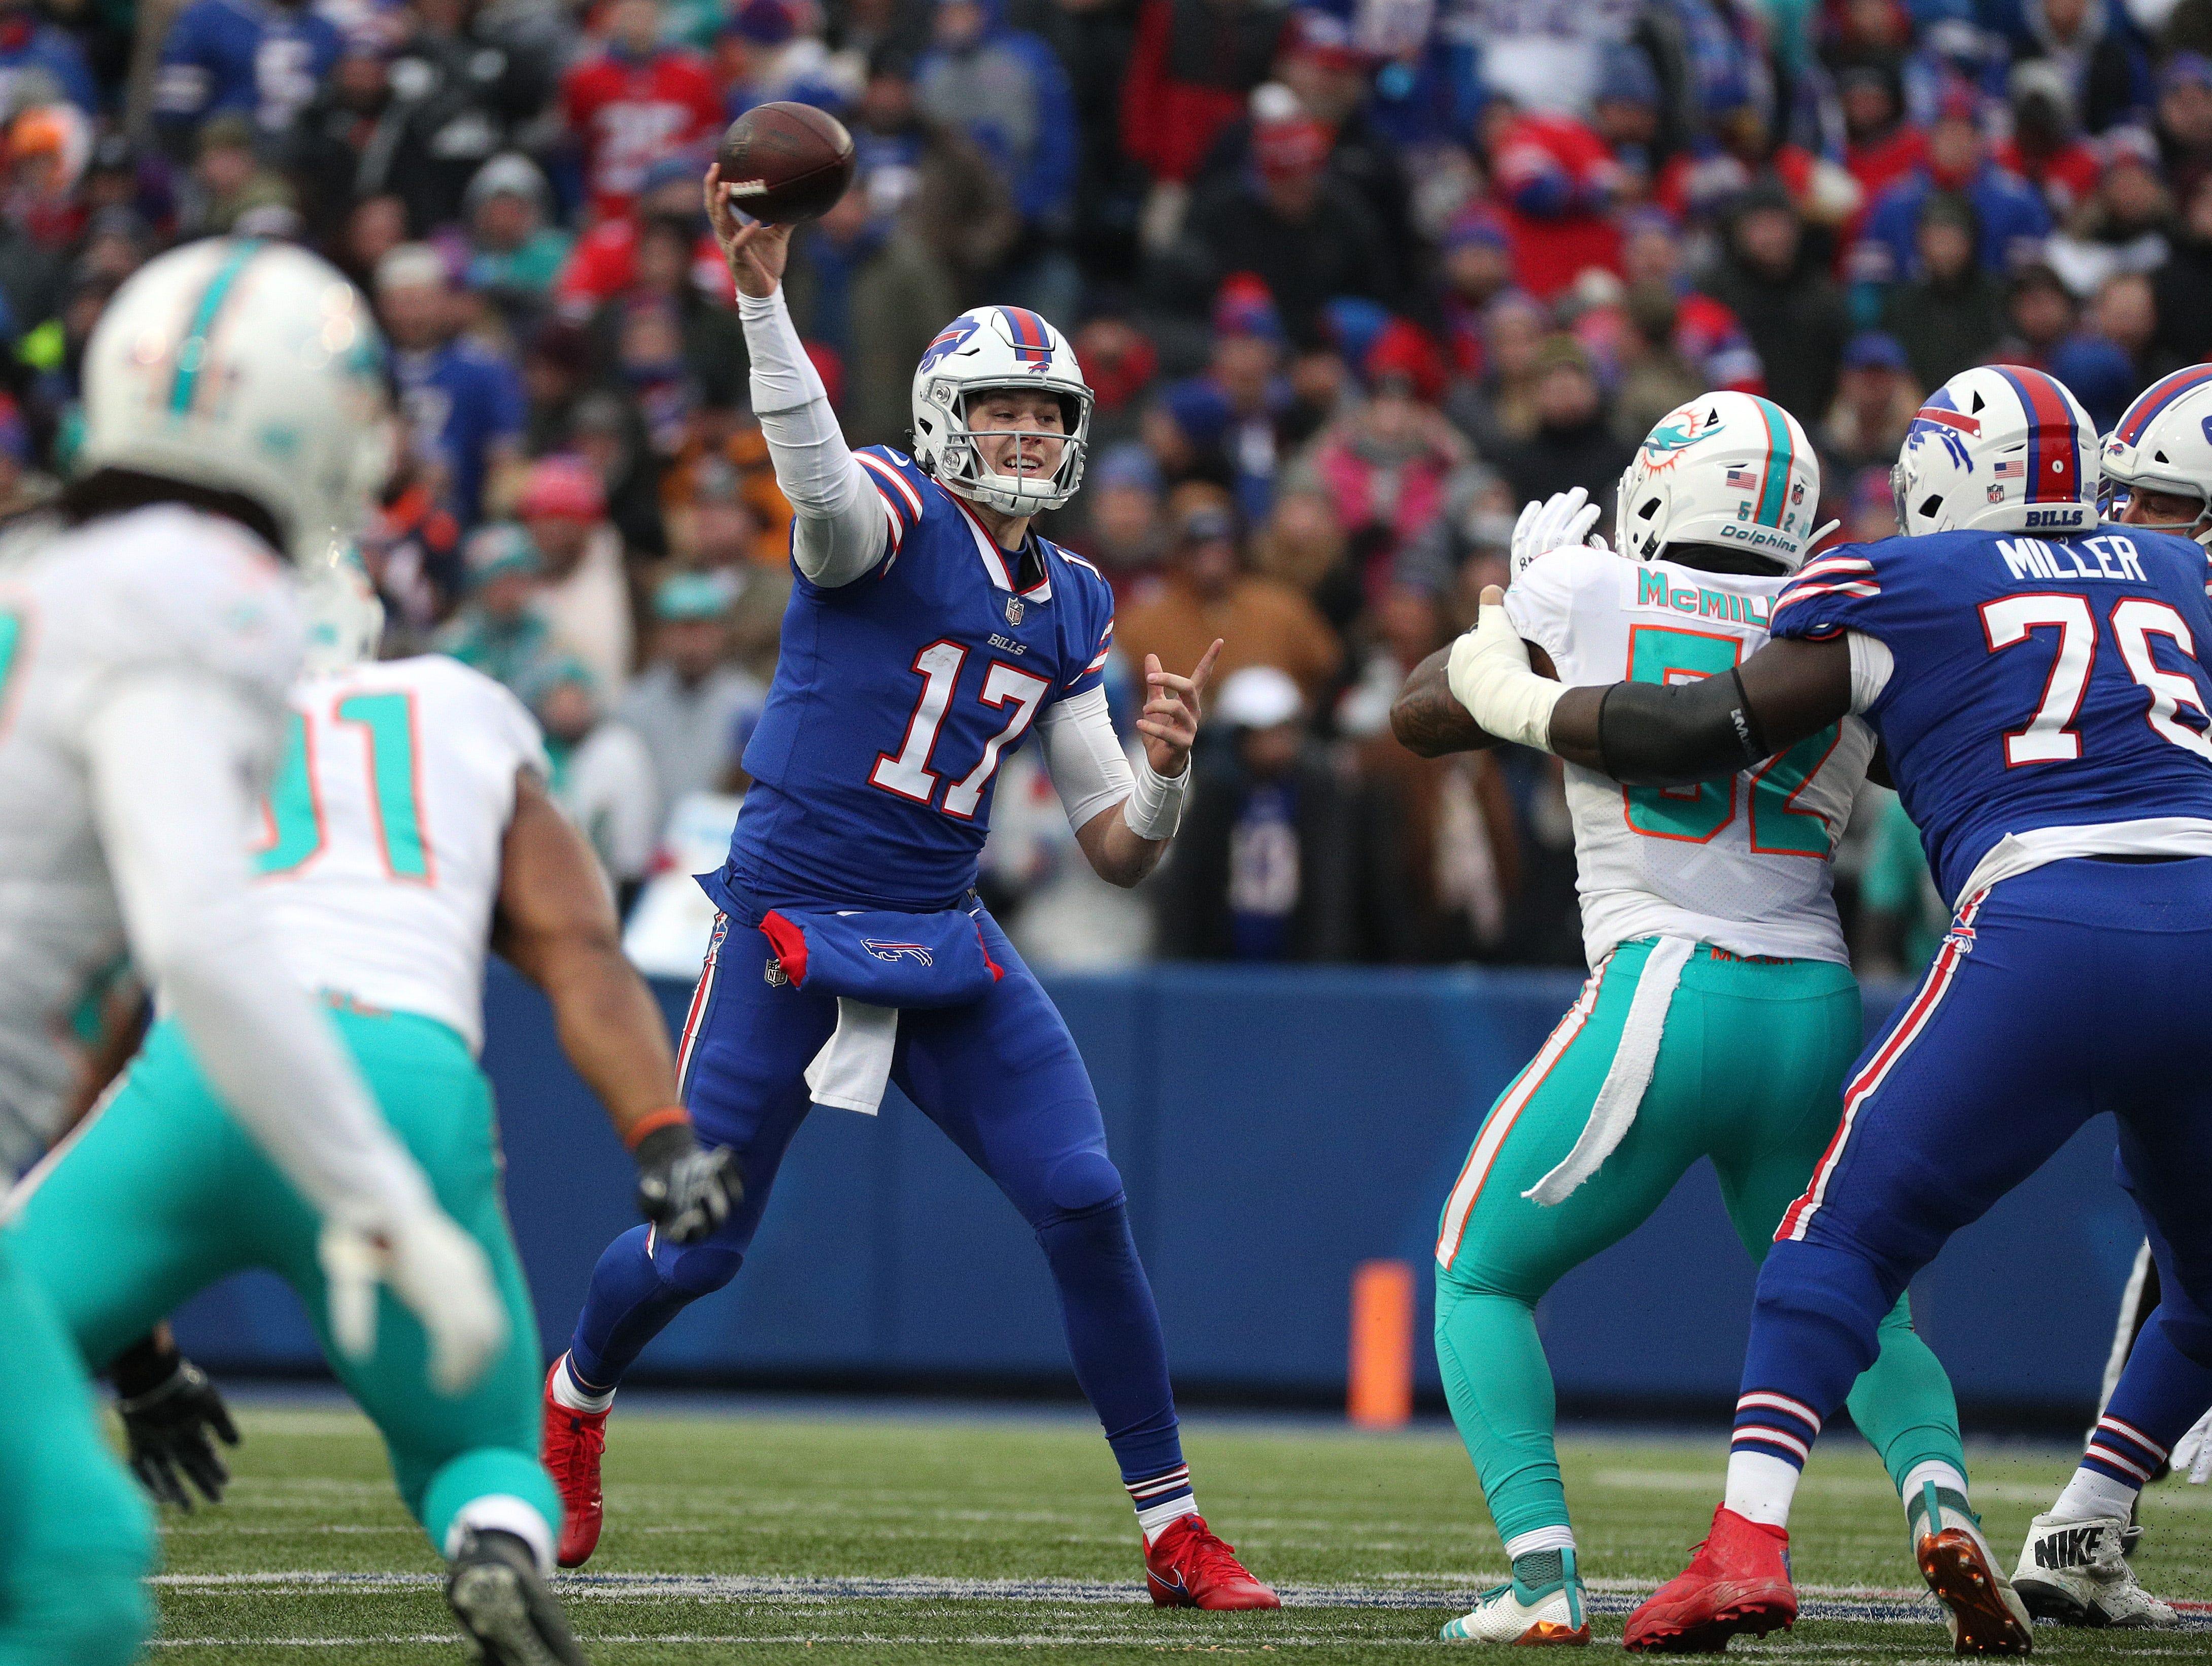 Bills quarterback Josh Allen steps into a throw against Miami.